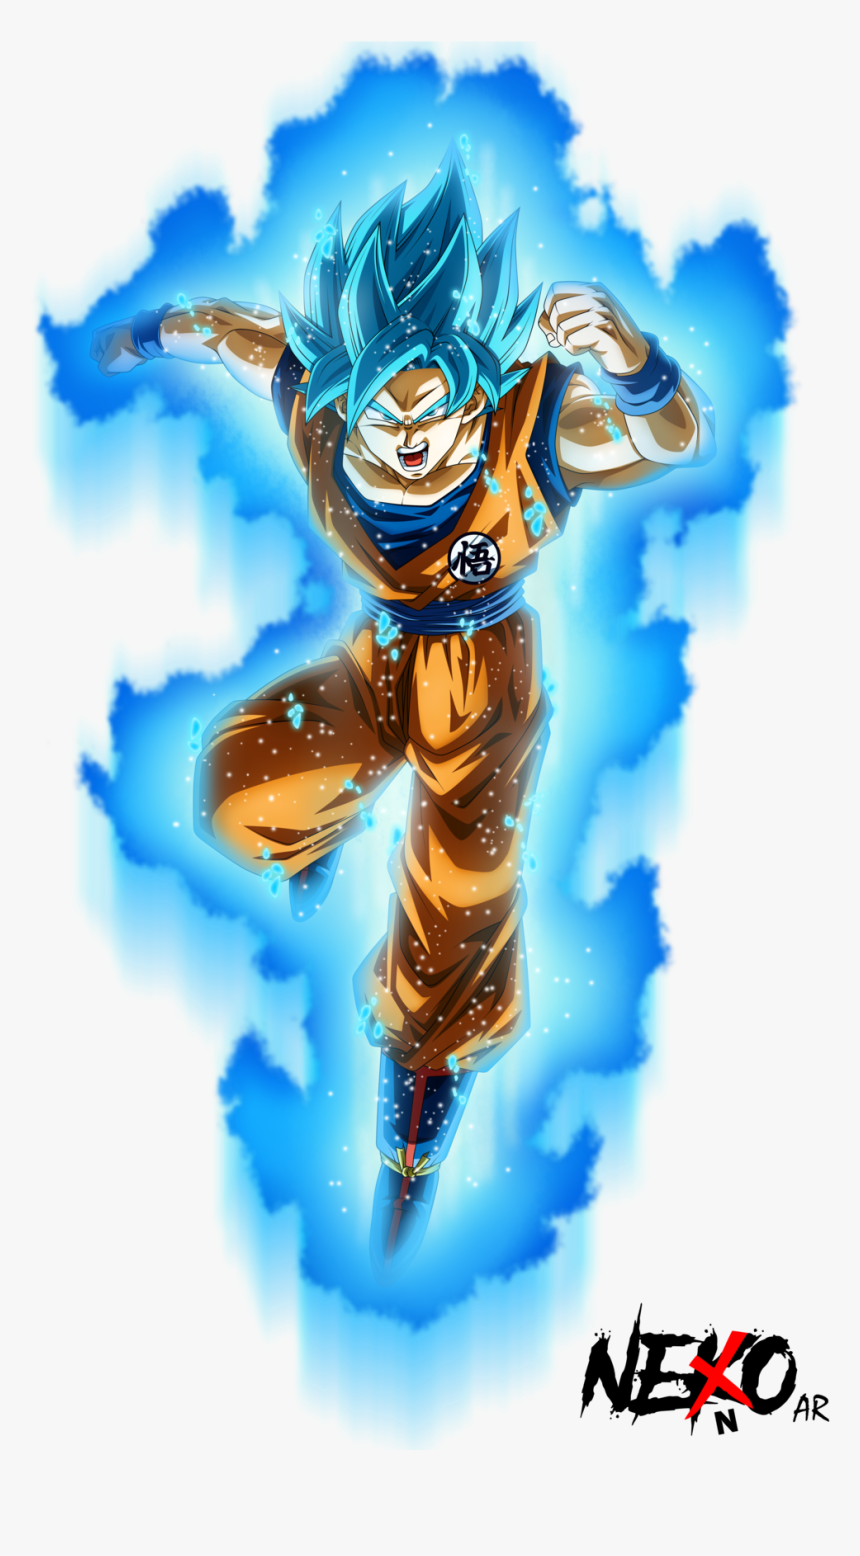 Super Saiyan Blue Goku By Nekoar - Dragon Ball Super Goku Super Sayajin Blue, HD Png Download, Free Download